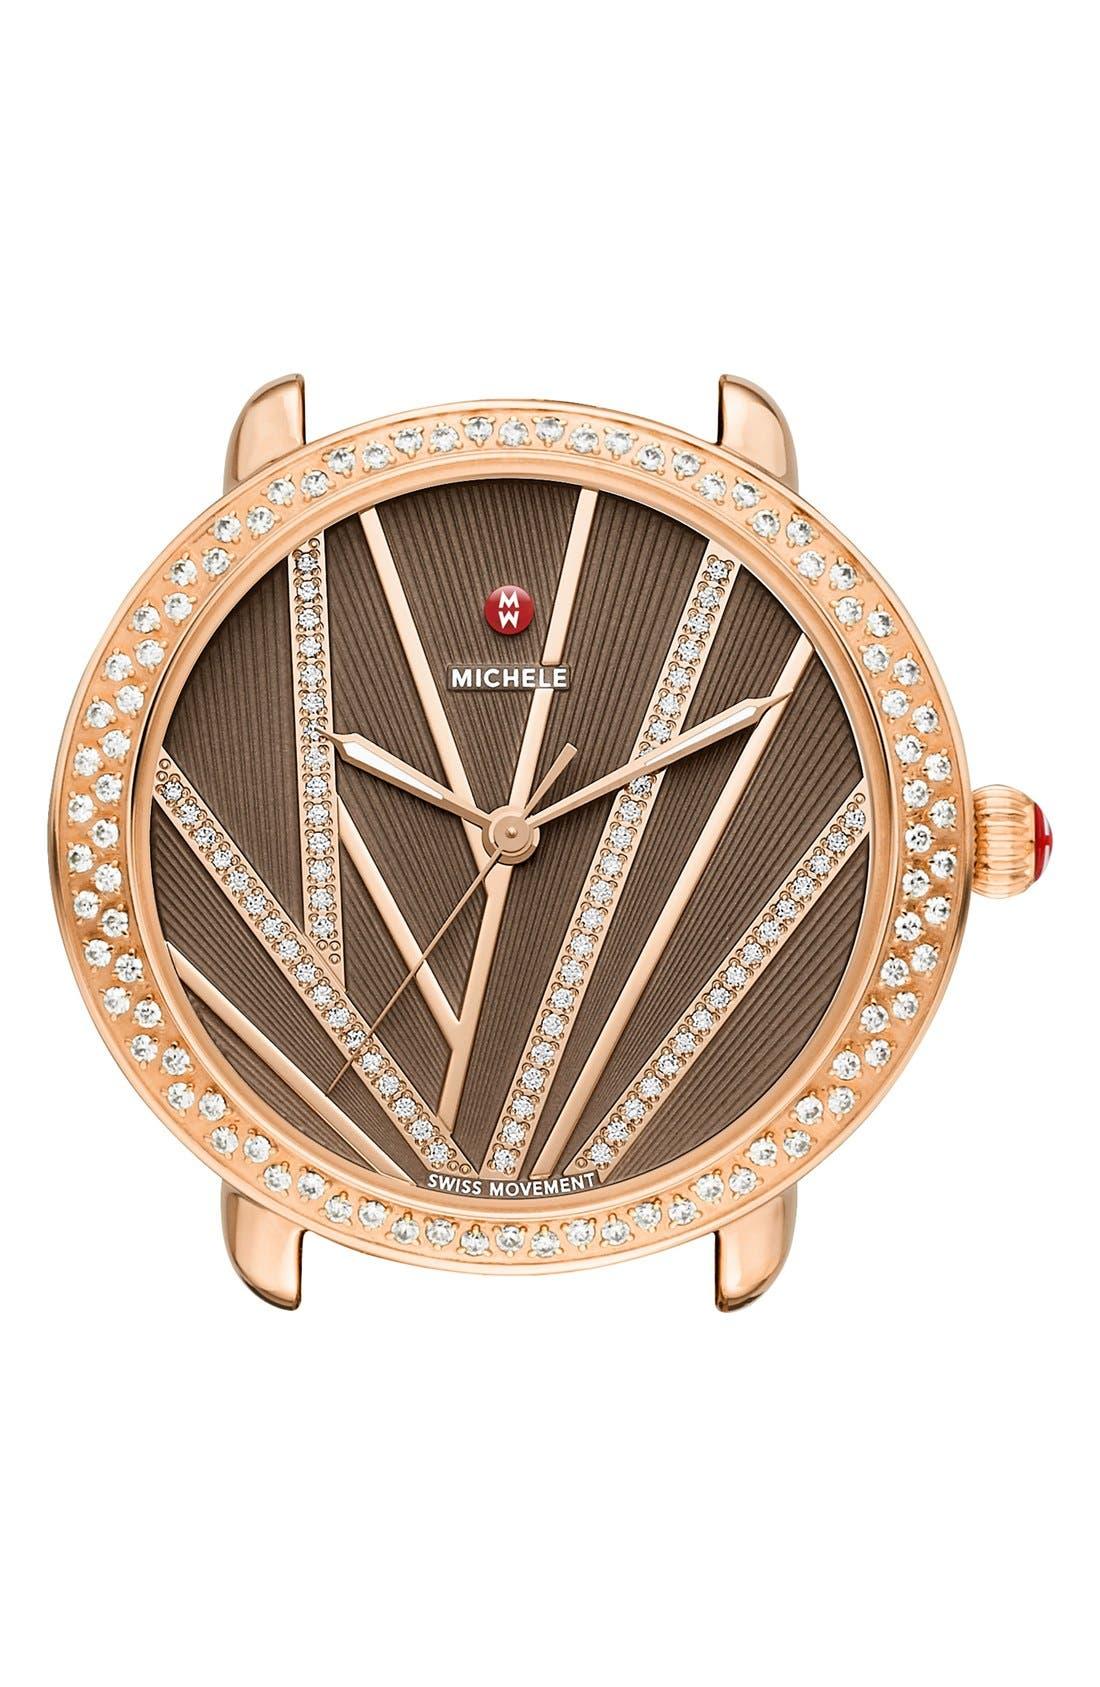 MICHELE Serein Mid City Lights Diamond Diamond Dial Watch Case, 36mm